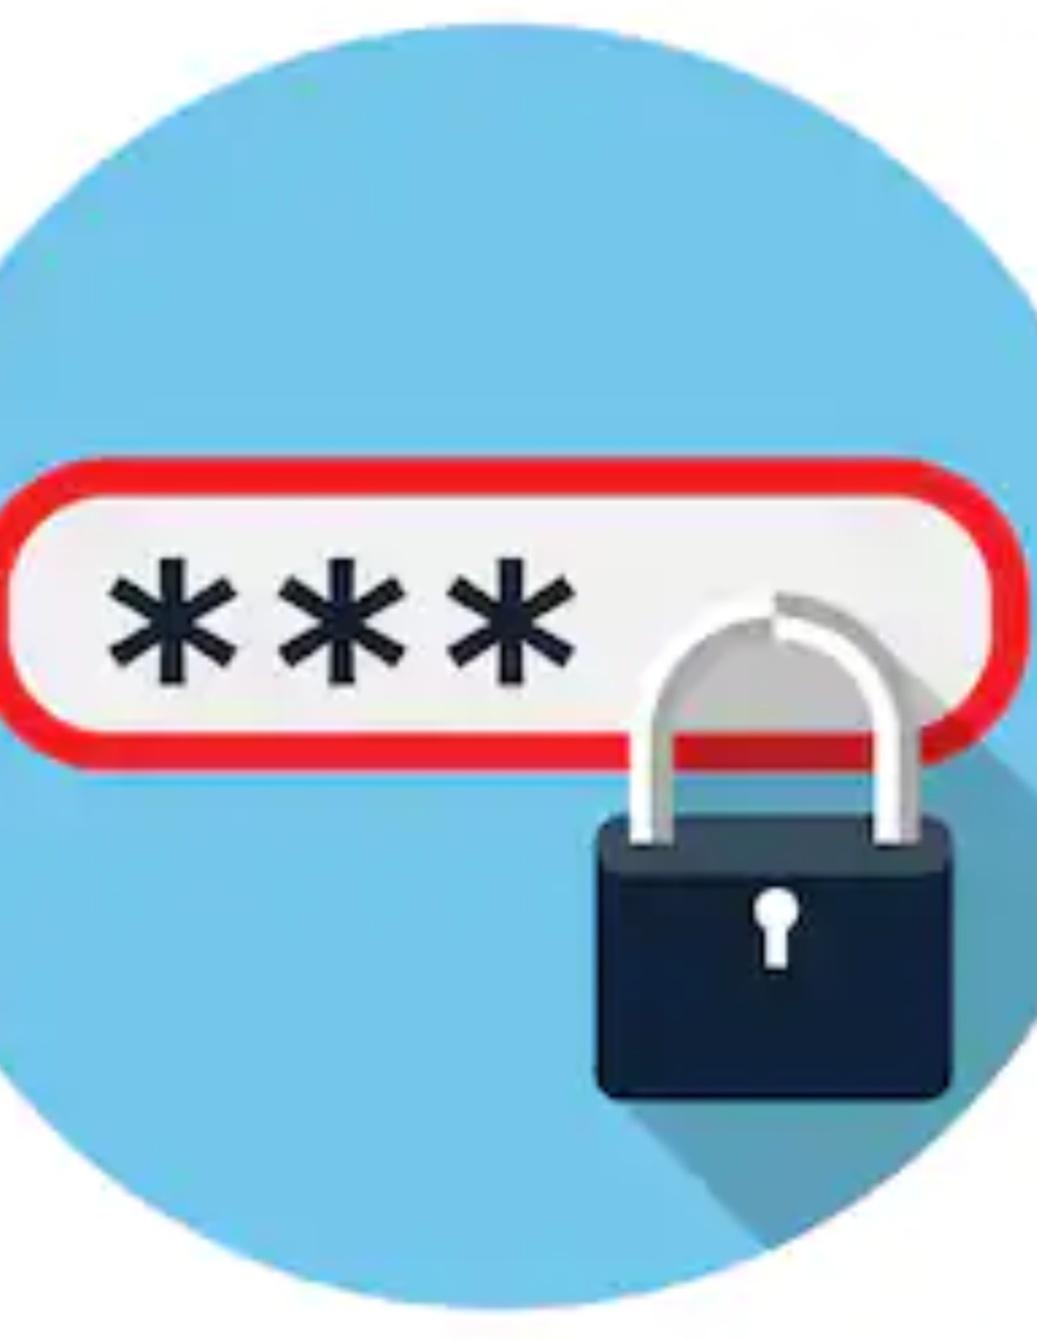 I will create a unique password